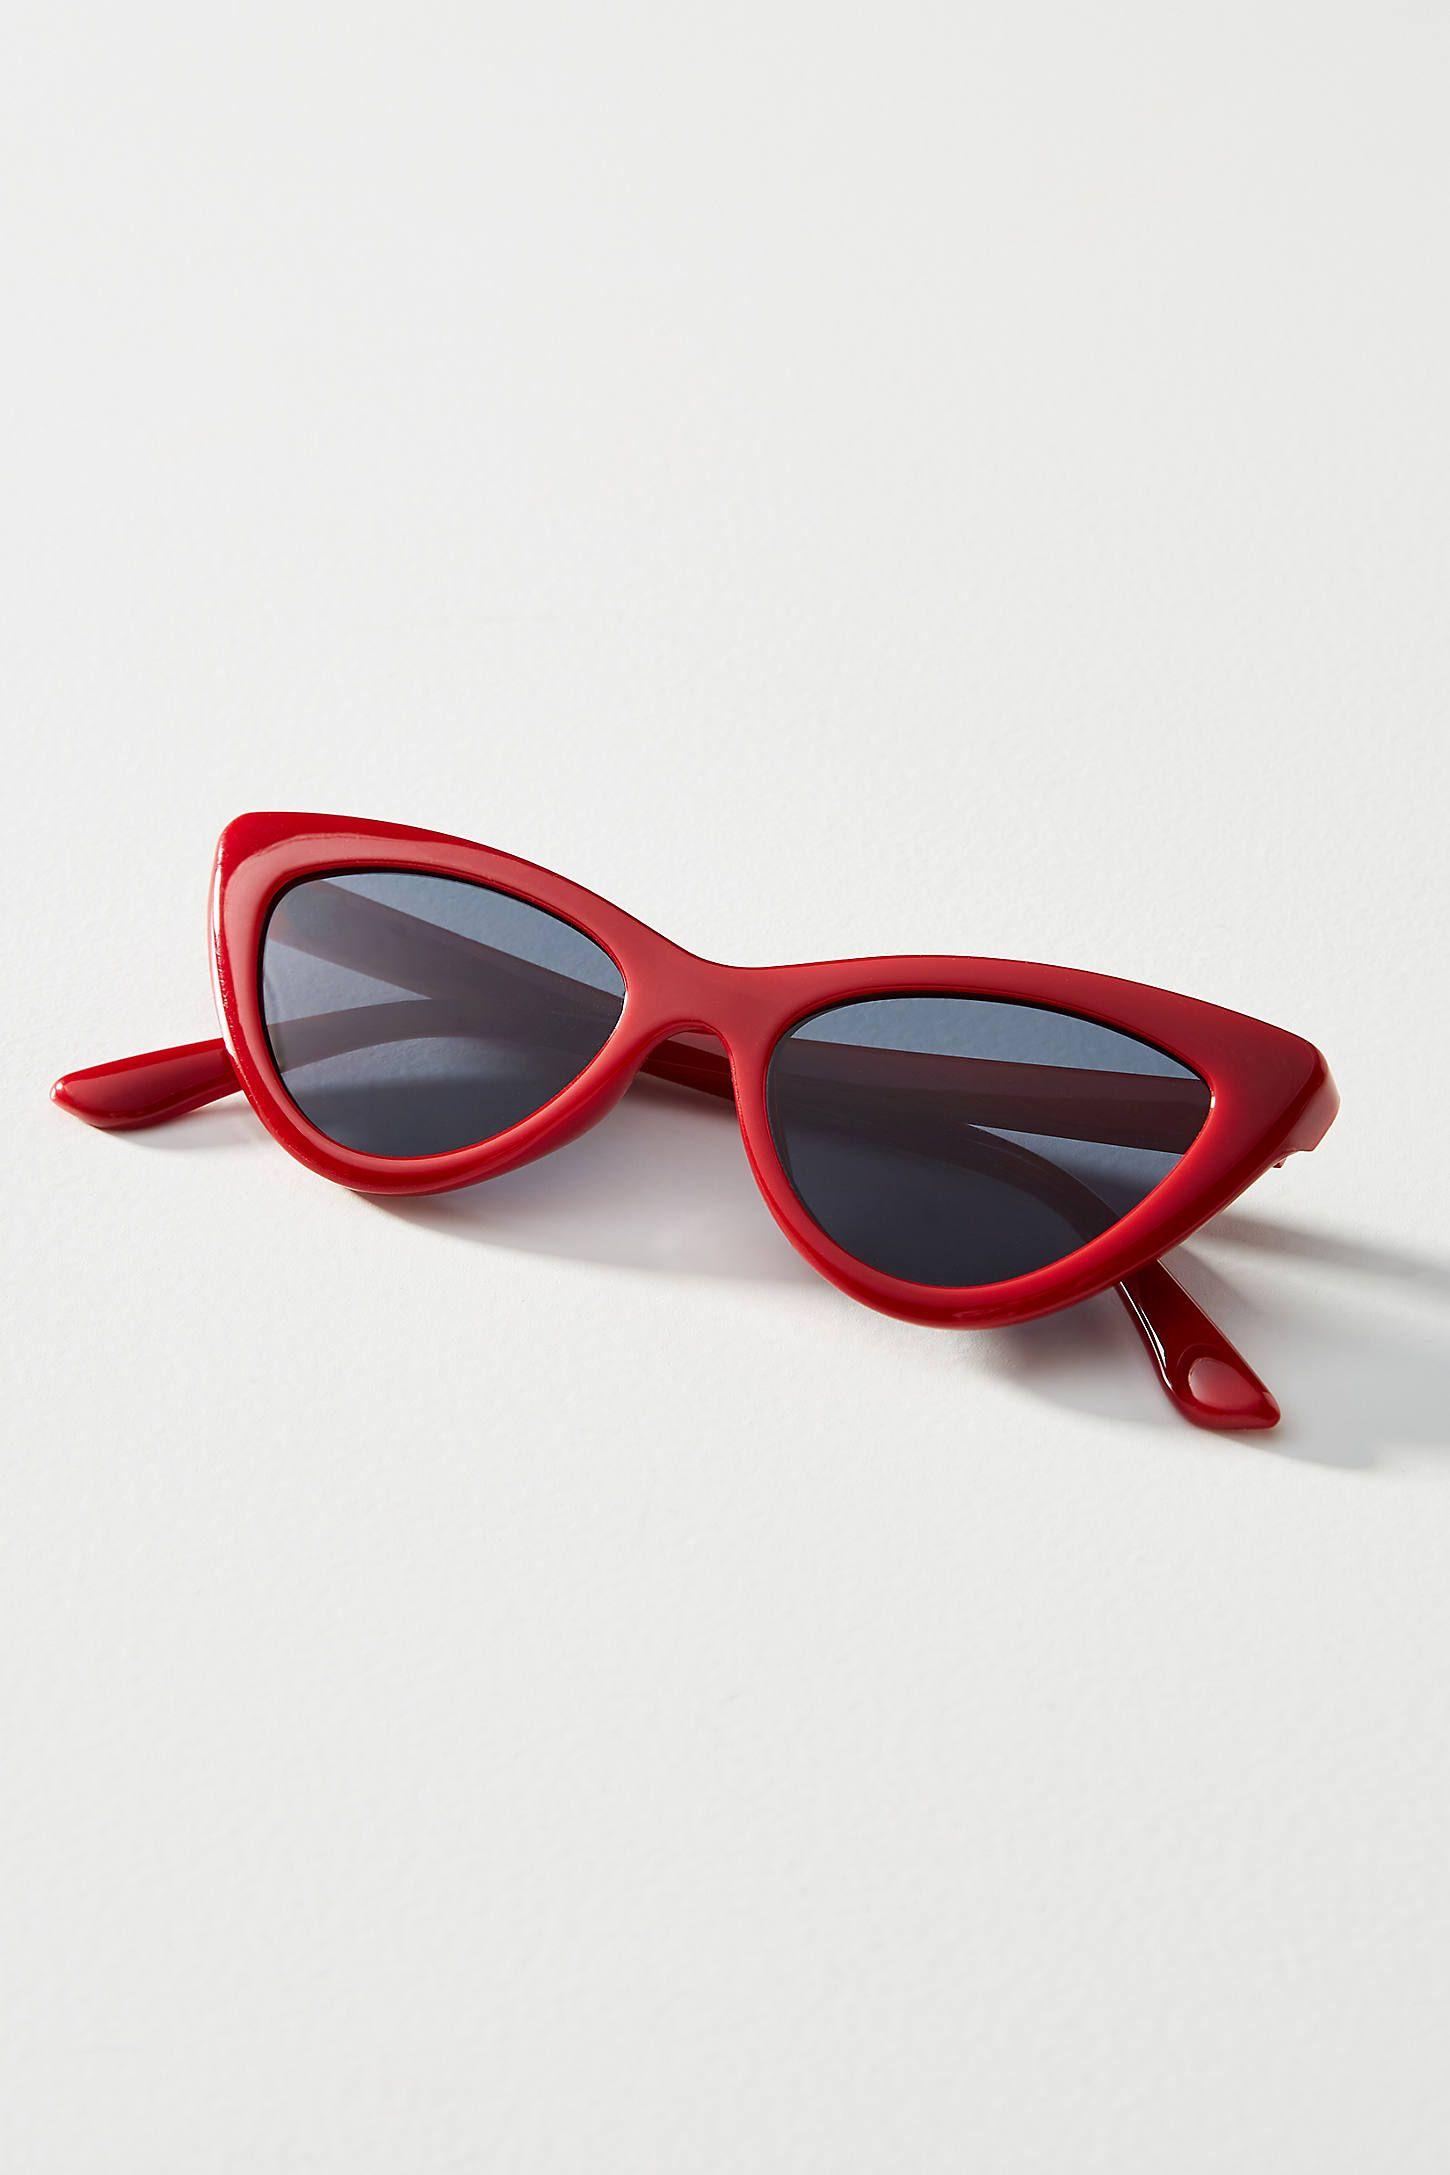 Margaux Cat Eye Sunglasses In 2020 Cat Eye Sunglasses Sunglasses Red Sunglasses